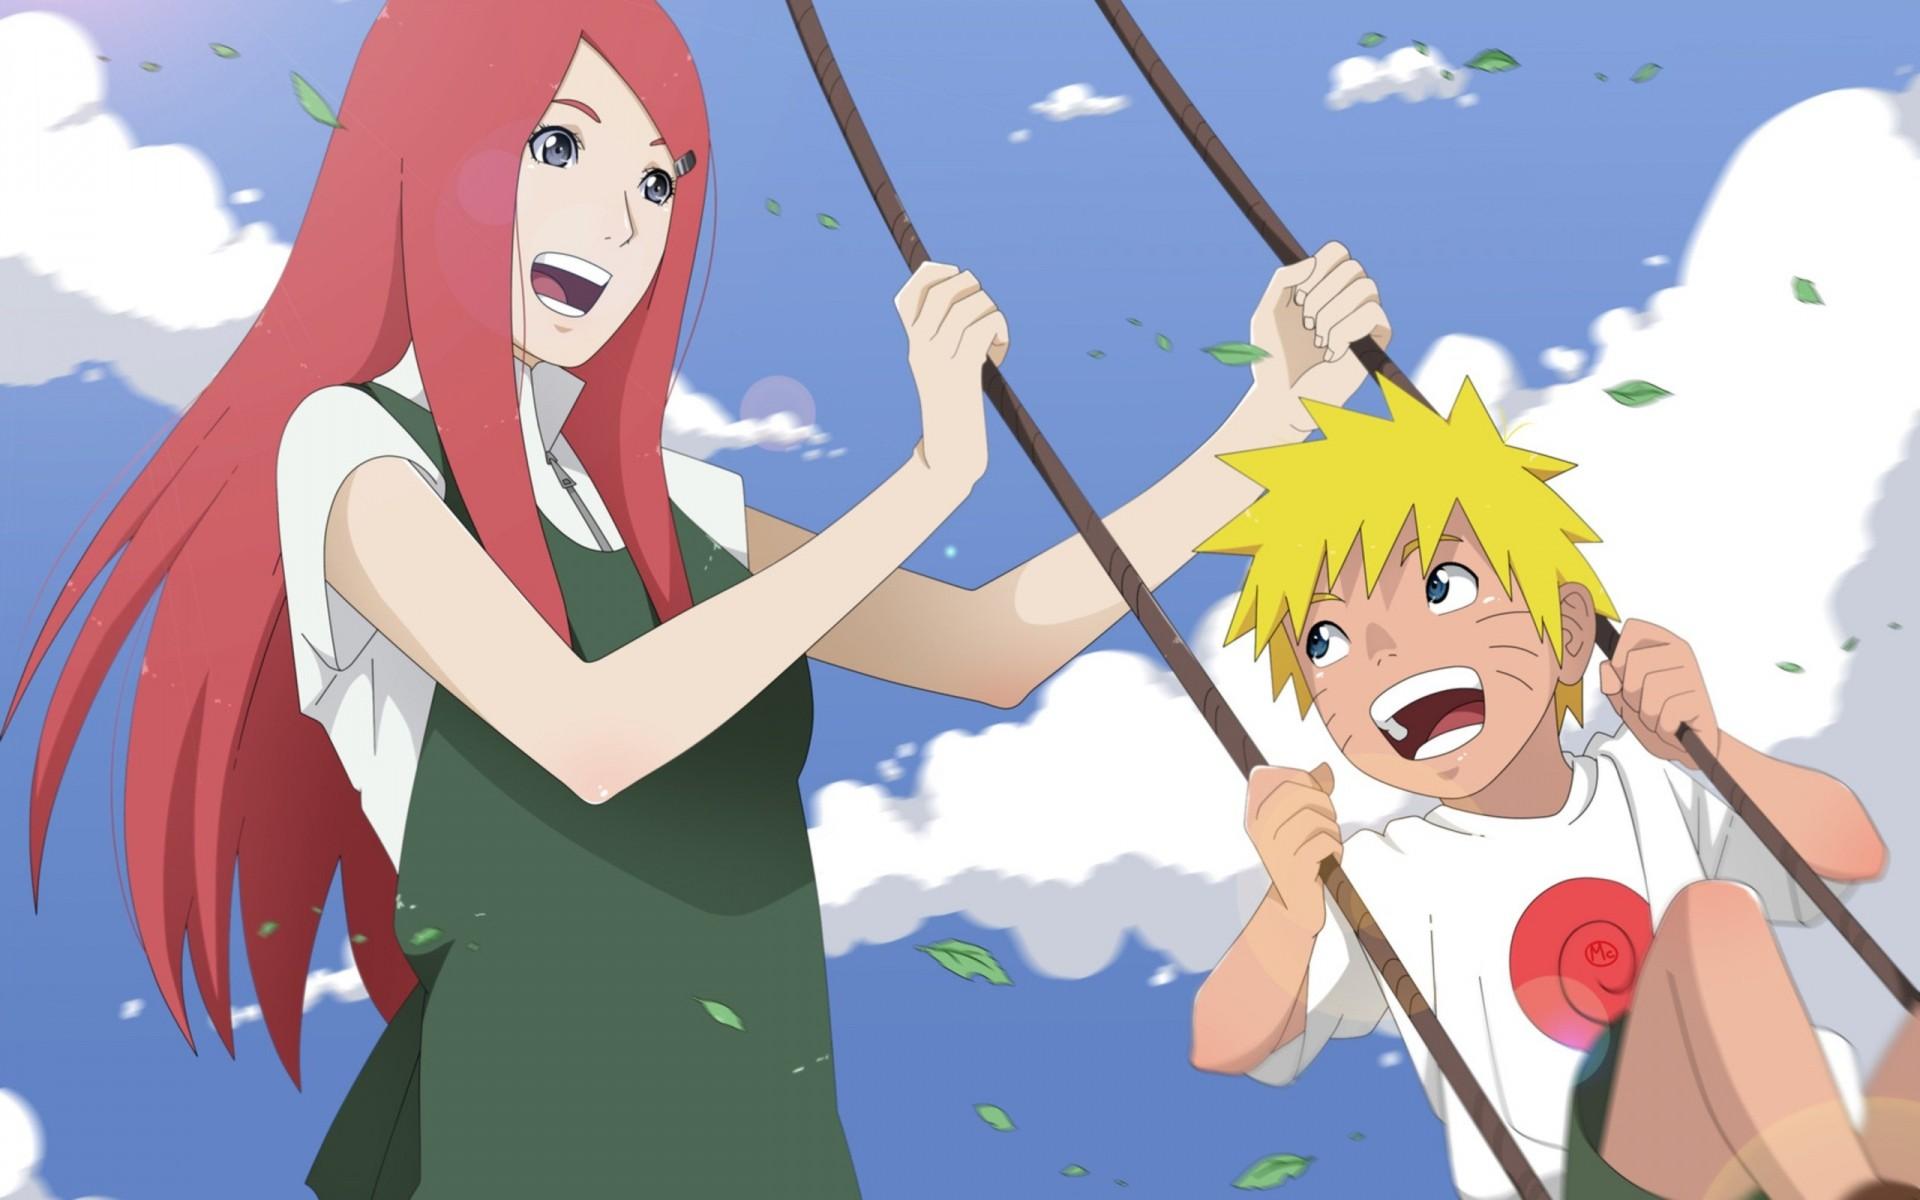 Unduh 92 Wallpaper Animasi Naruto Hd HD Gratid